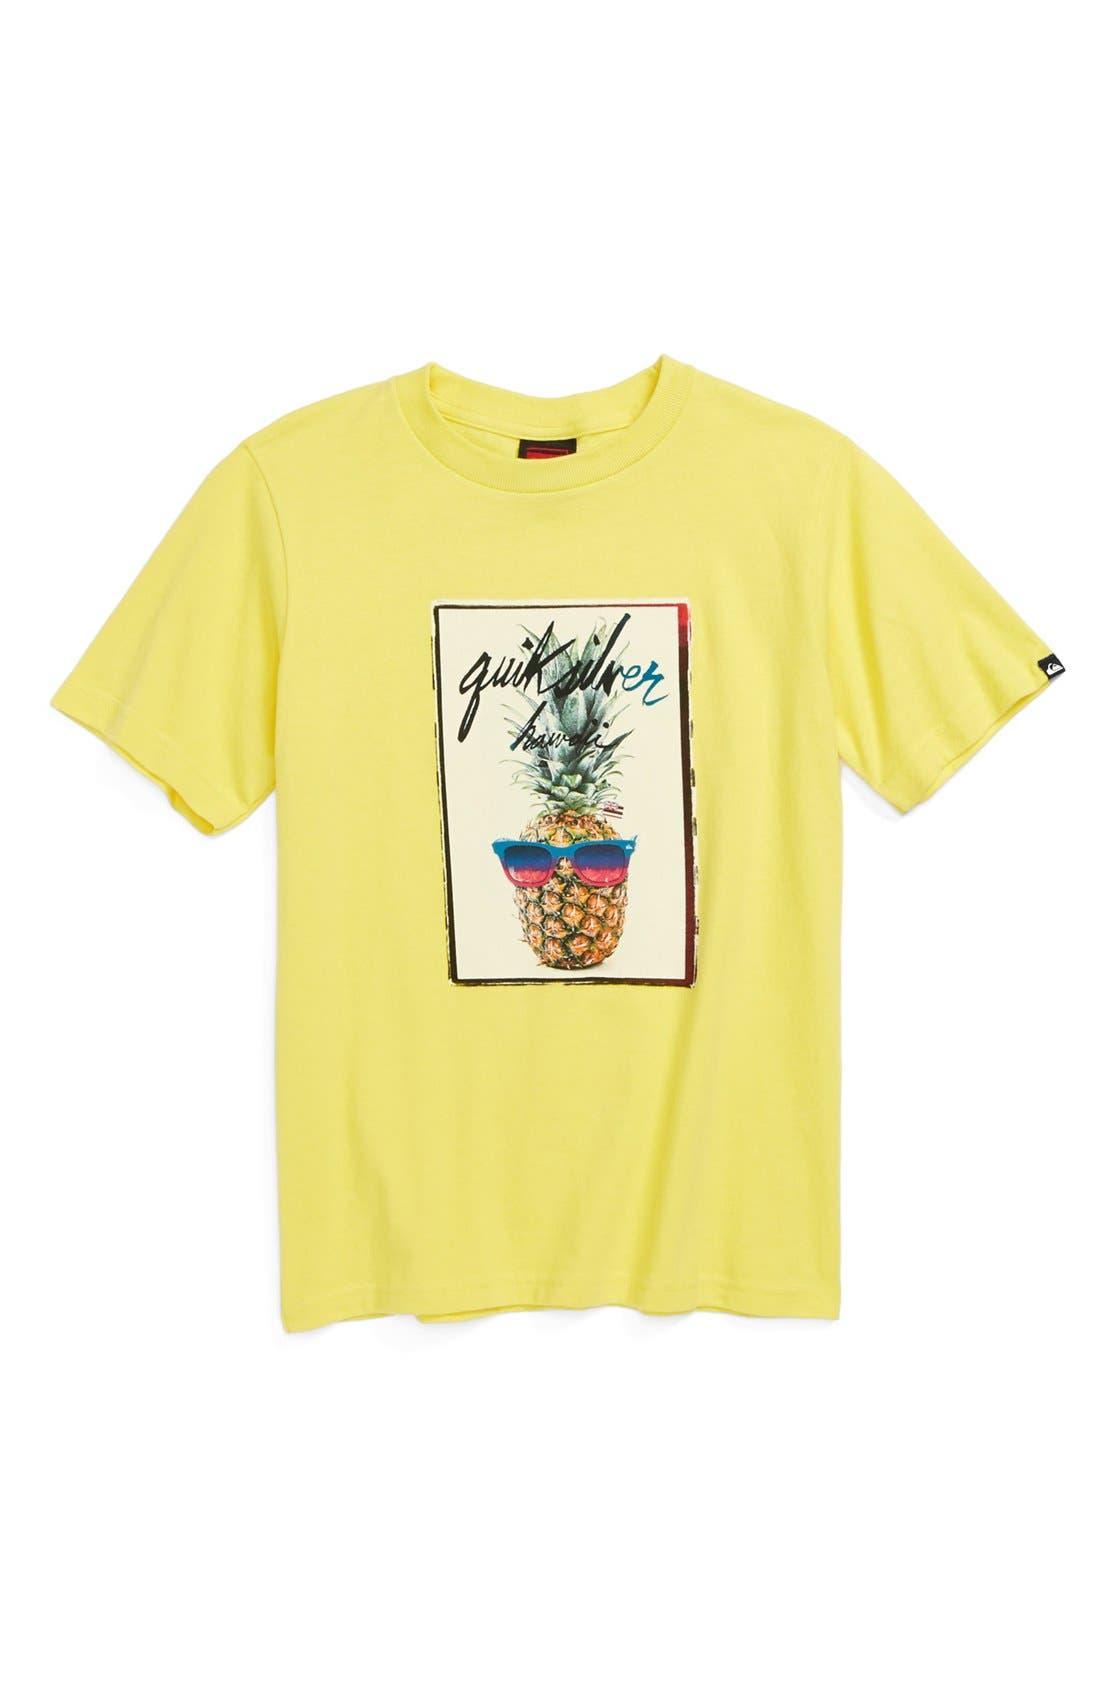 Main Image - Quiksilver 'Pine On' Graphic T-Shirt (Big Boys)